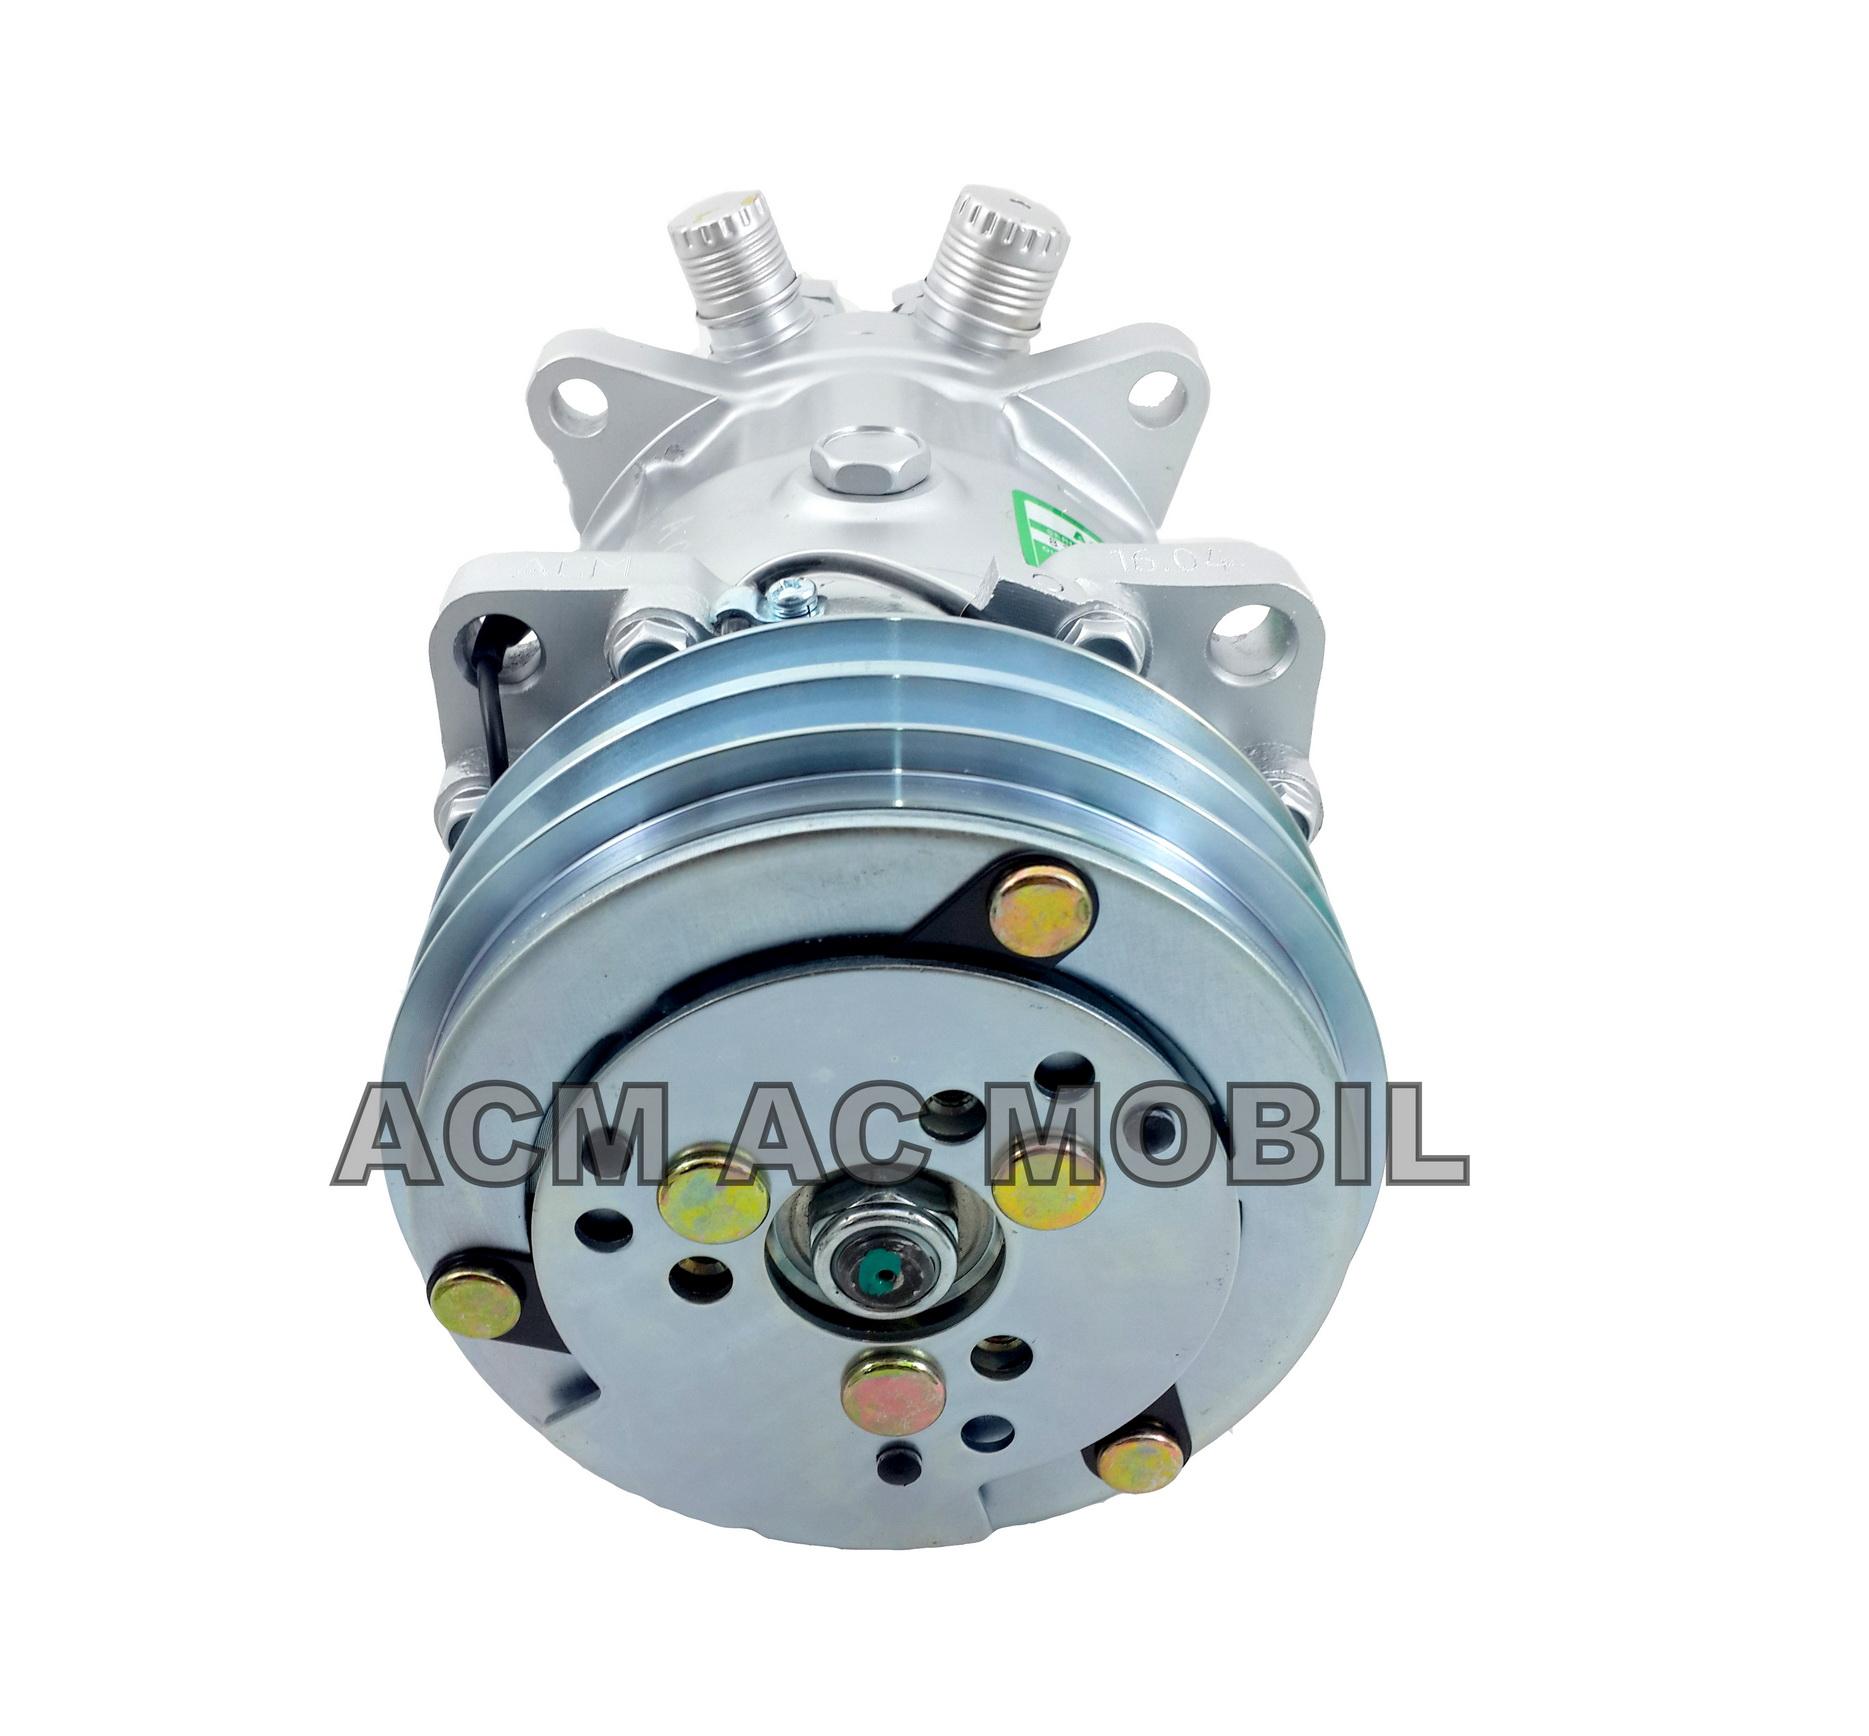 Compressor 508 F Acm Kondensor Chevrolet Aveo Ac Mobil Kompresor Jual Hcc Hanon